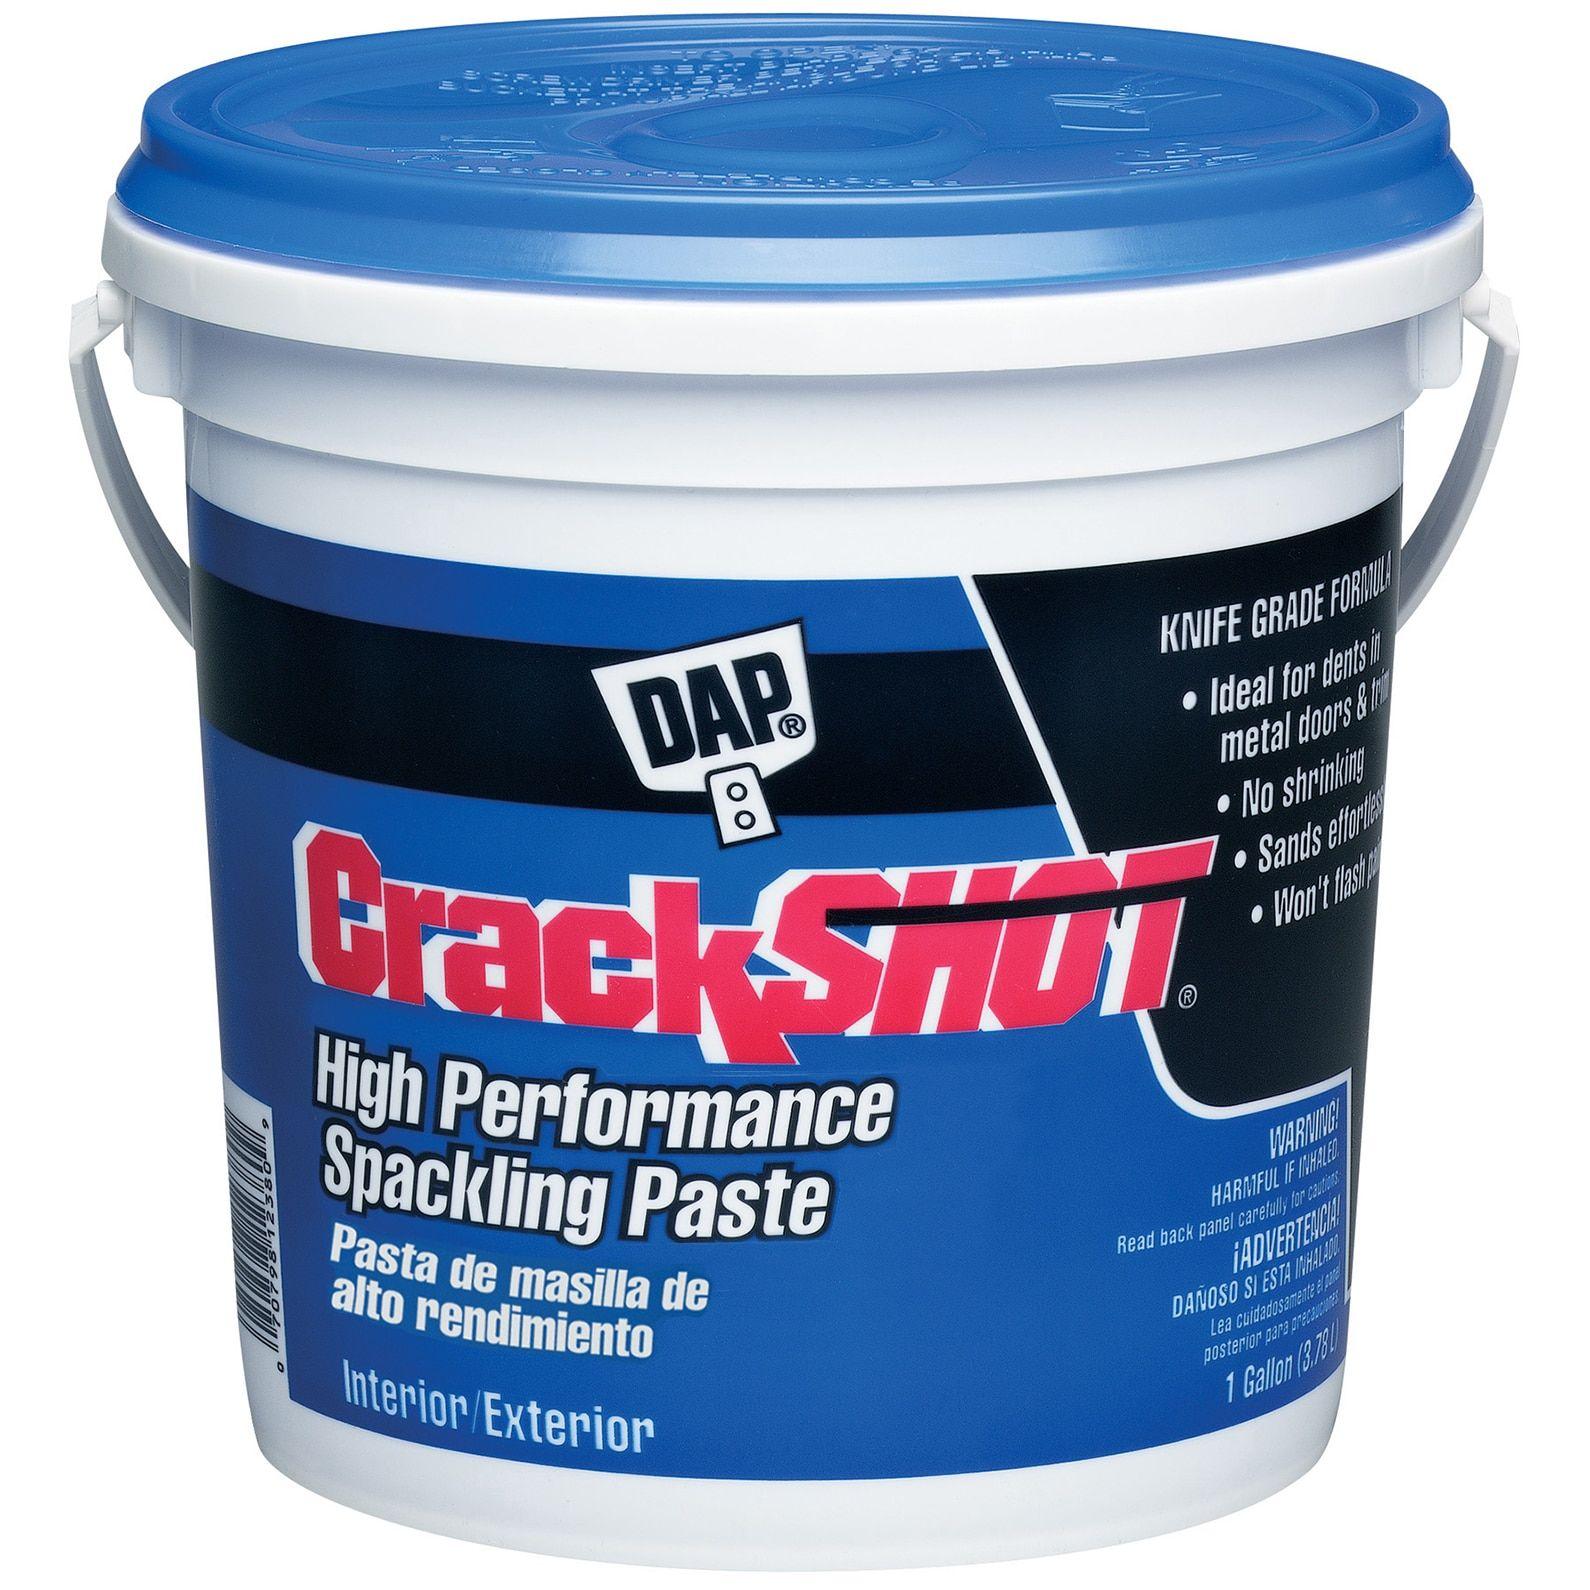 Dap 12380 1 Gallon CrackShot Spackling Interior/Exterior